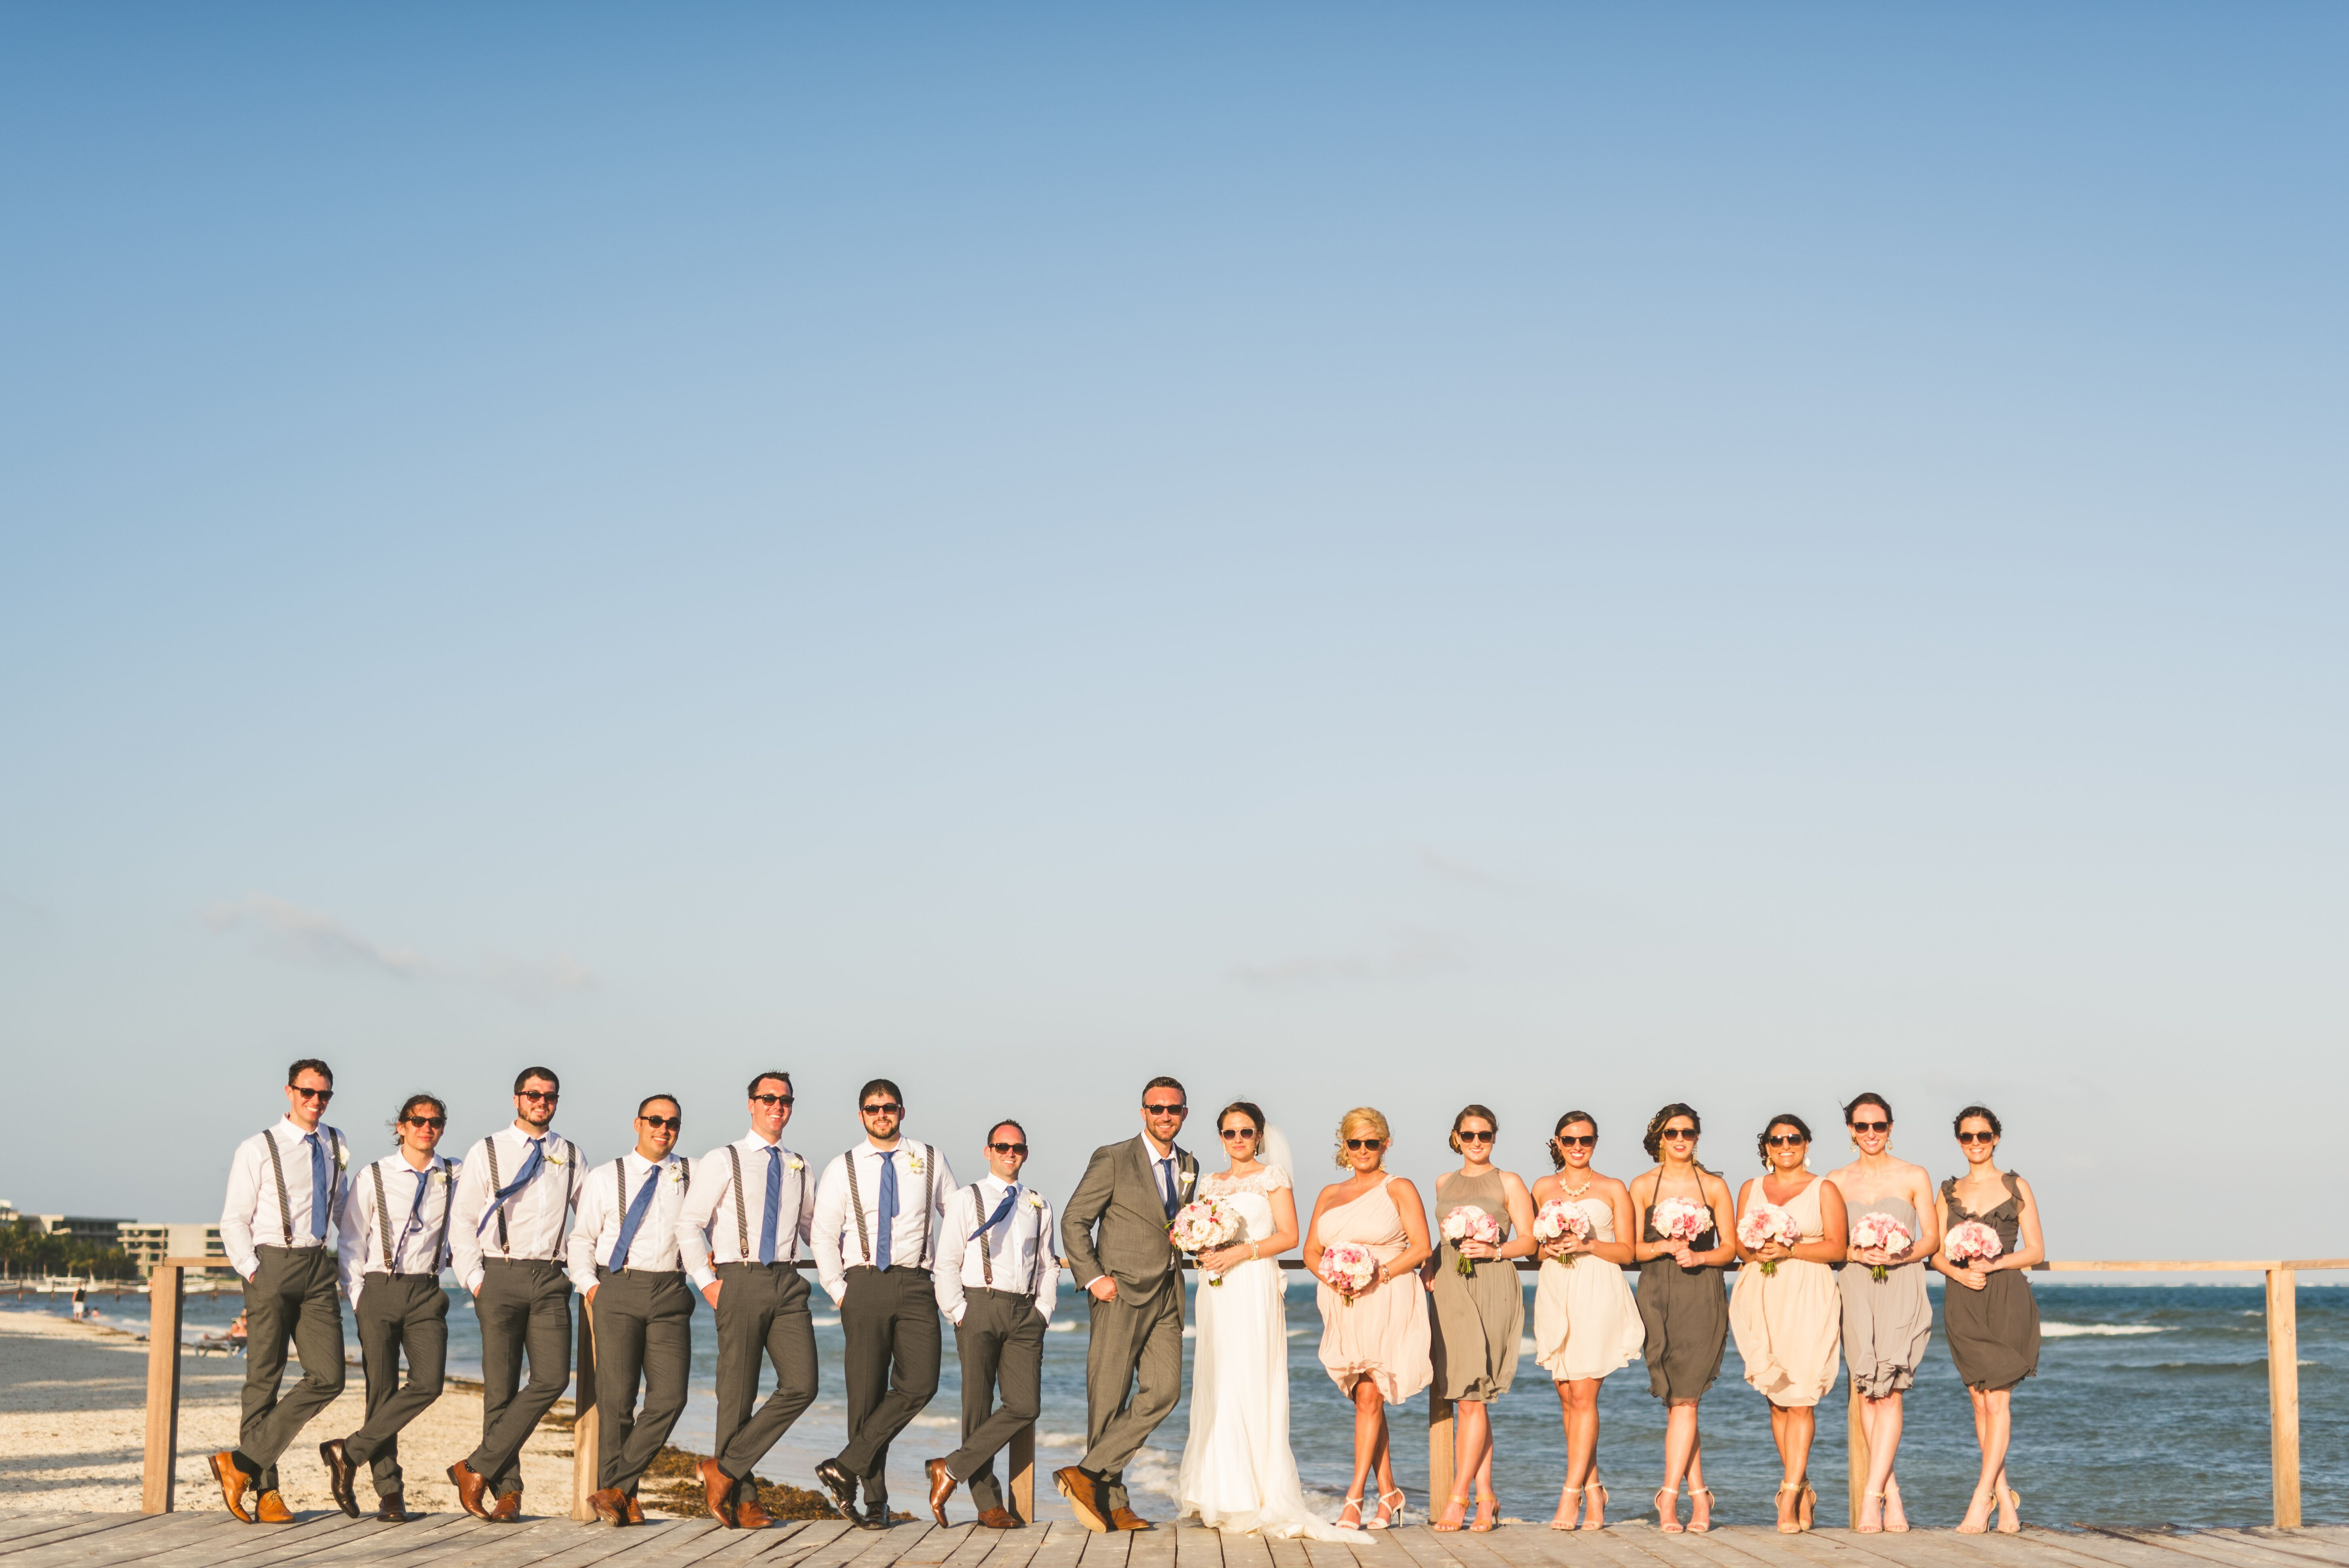 Neutral Bridesmaid Dresses for Beach Wedding